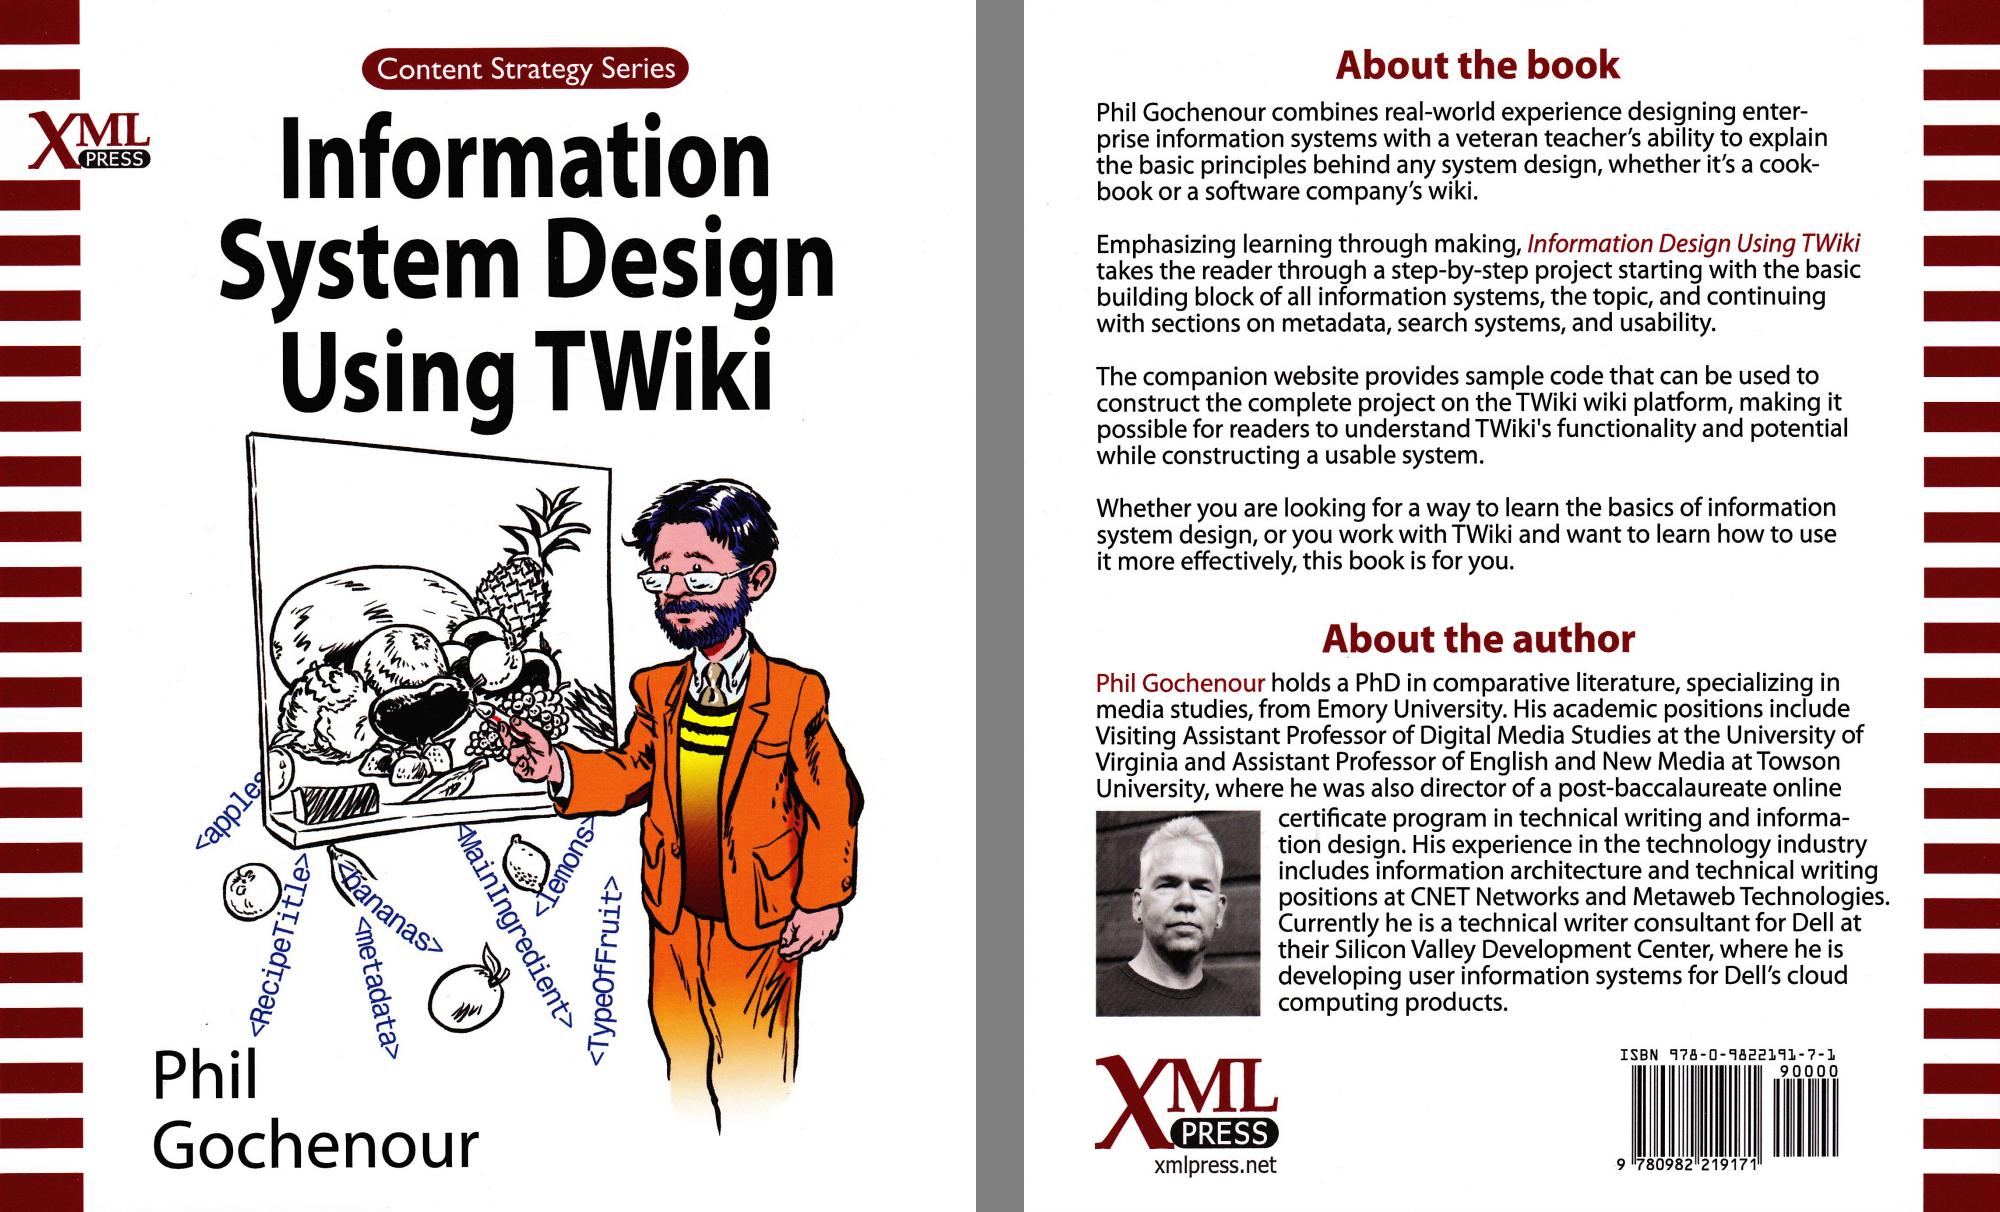 Book Cover Layout Xml ~ Informationsystemdesignusingtwiki